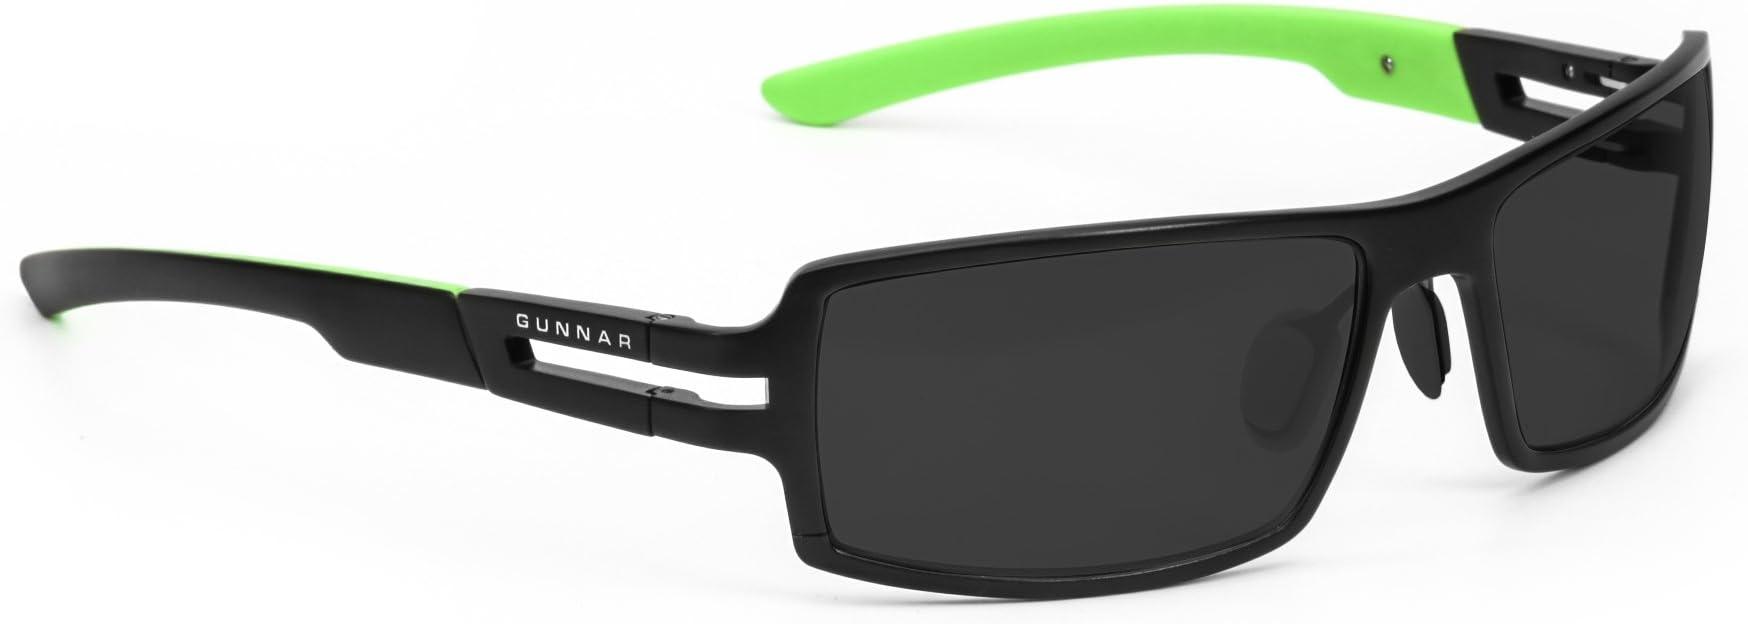 60efb0d69cc2 Amazon.com  GUNNAR Gaming and Computer Eyewear Razer RPG Sunglasses ...